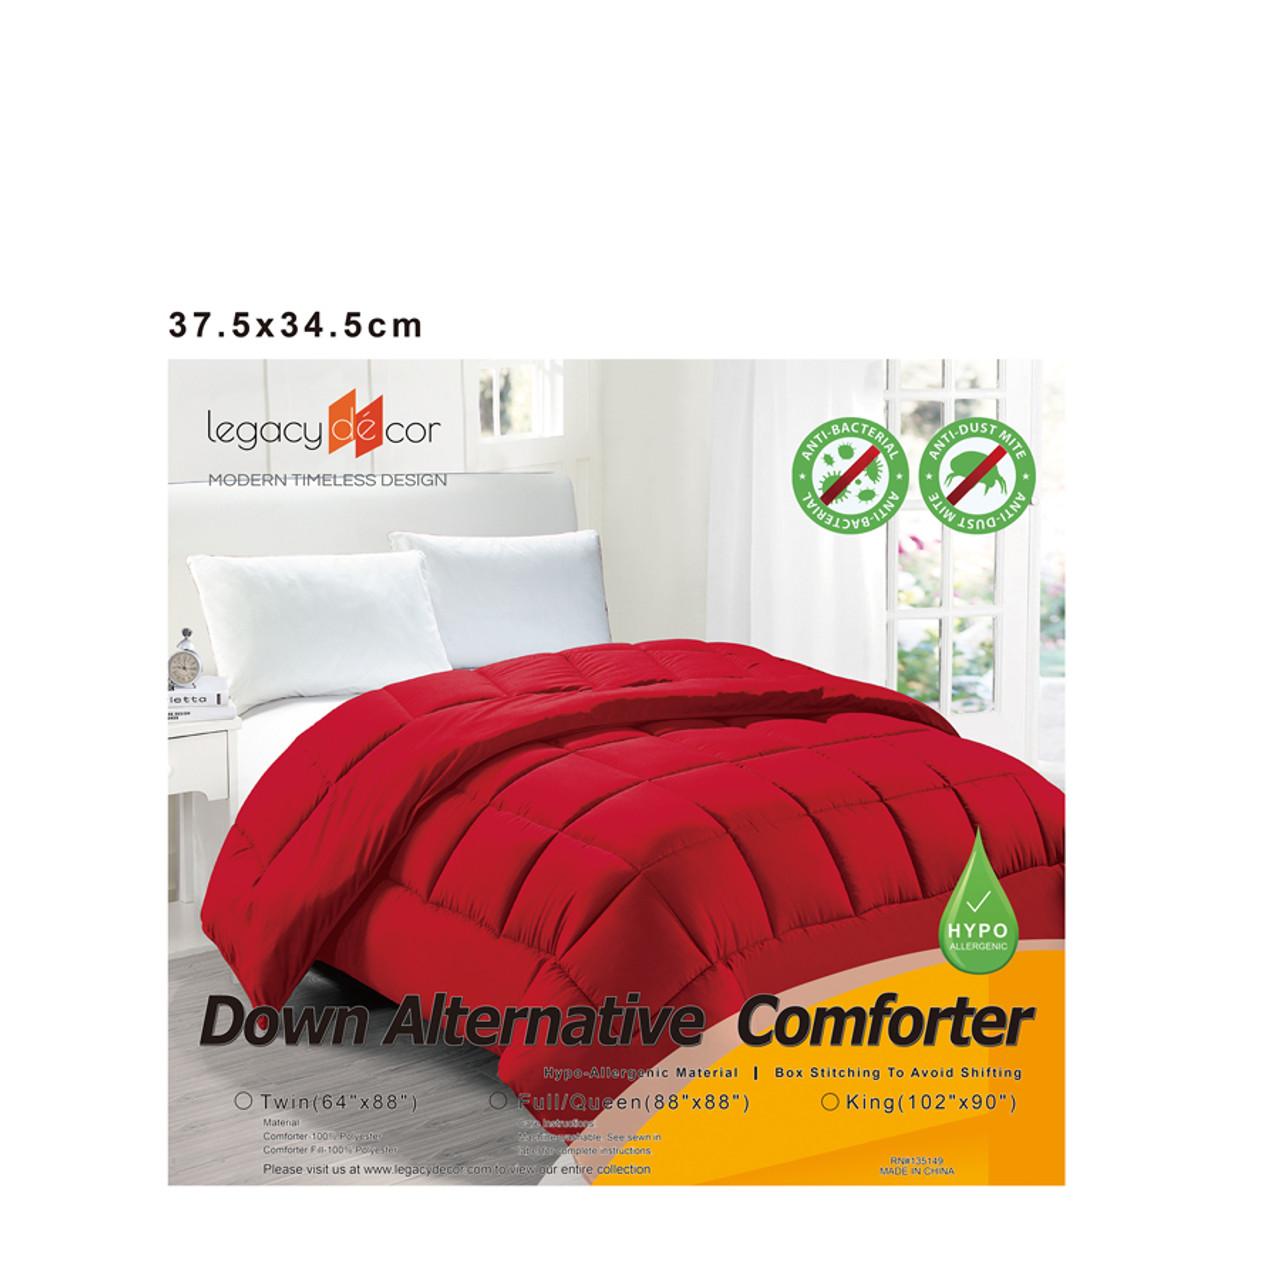 Down Alternative Hypoallergenic Comforter Red Color in USA, California, New York, Los Angeles, San Francisco, Pennsylvania, Washington DC, Virginia, Maryland